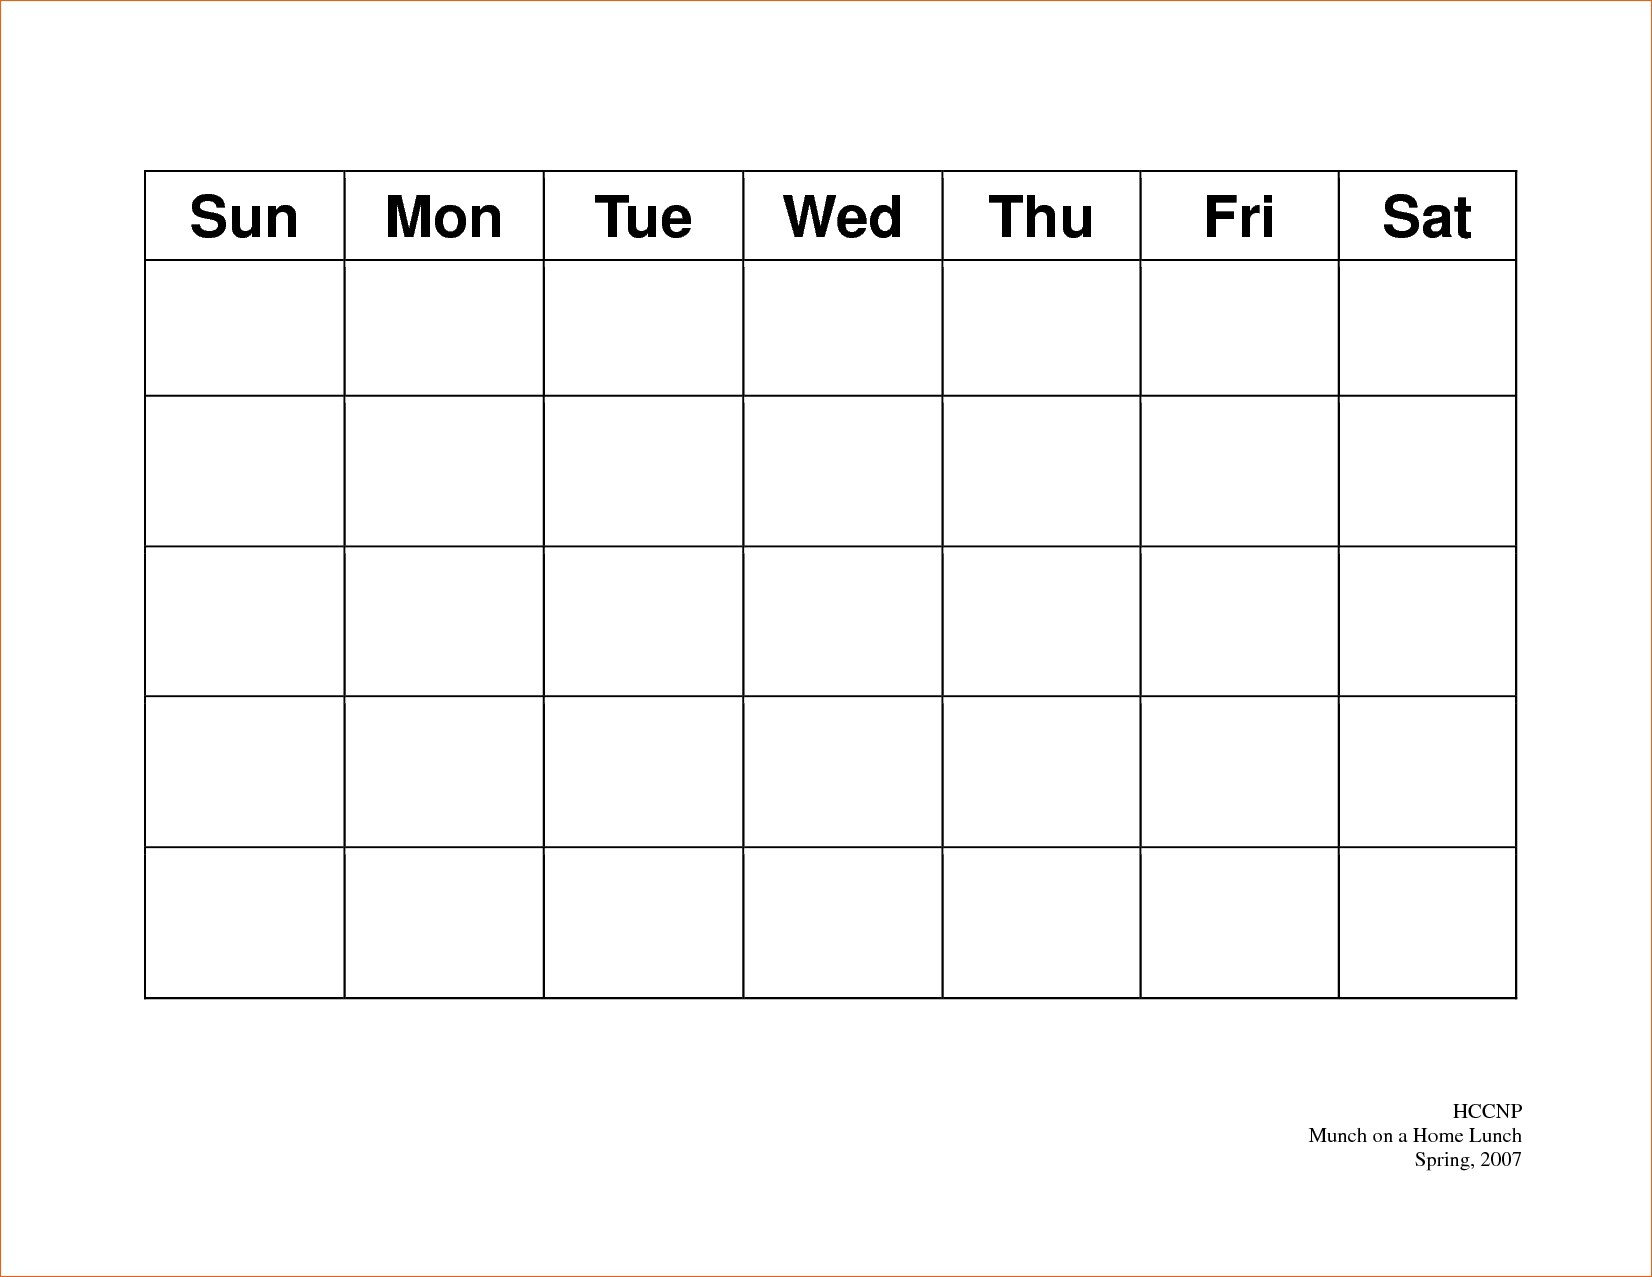 Calendar 5 Day Weekly Calendar Template On 5 Week Calendar Template intended for 5 Day Calendar Template